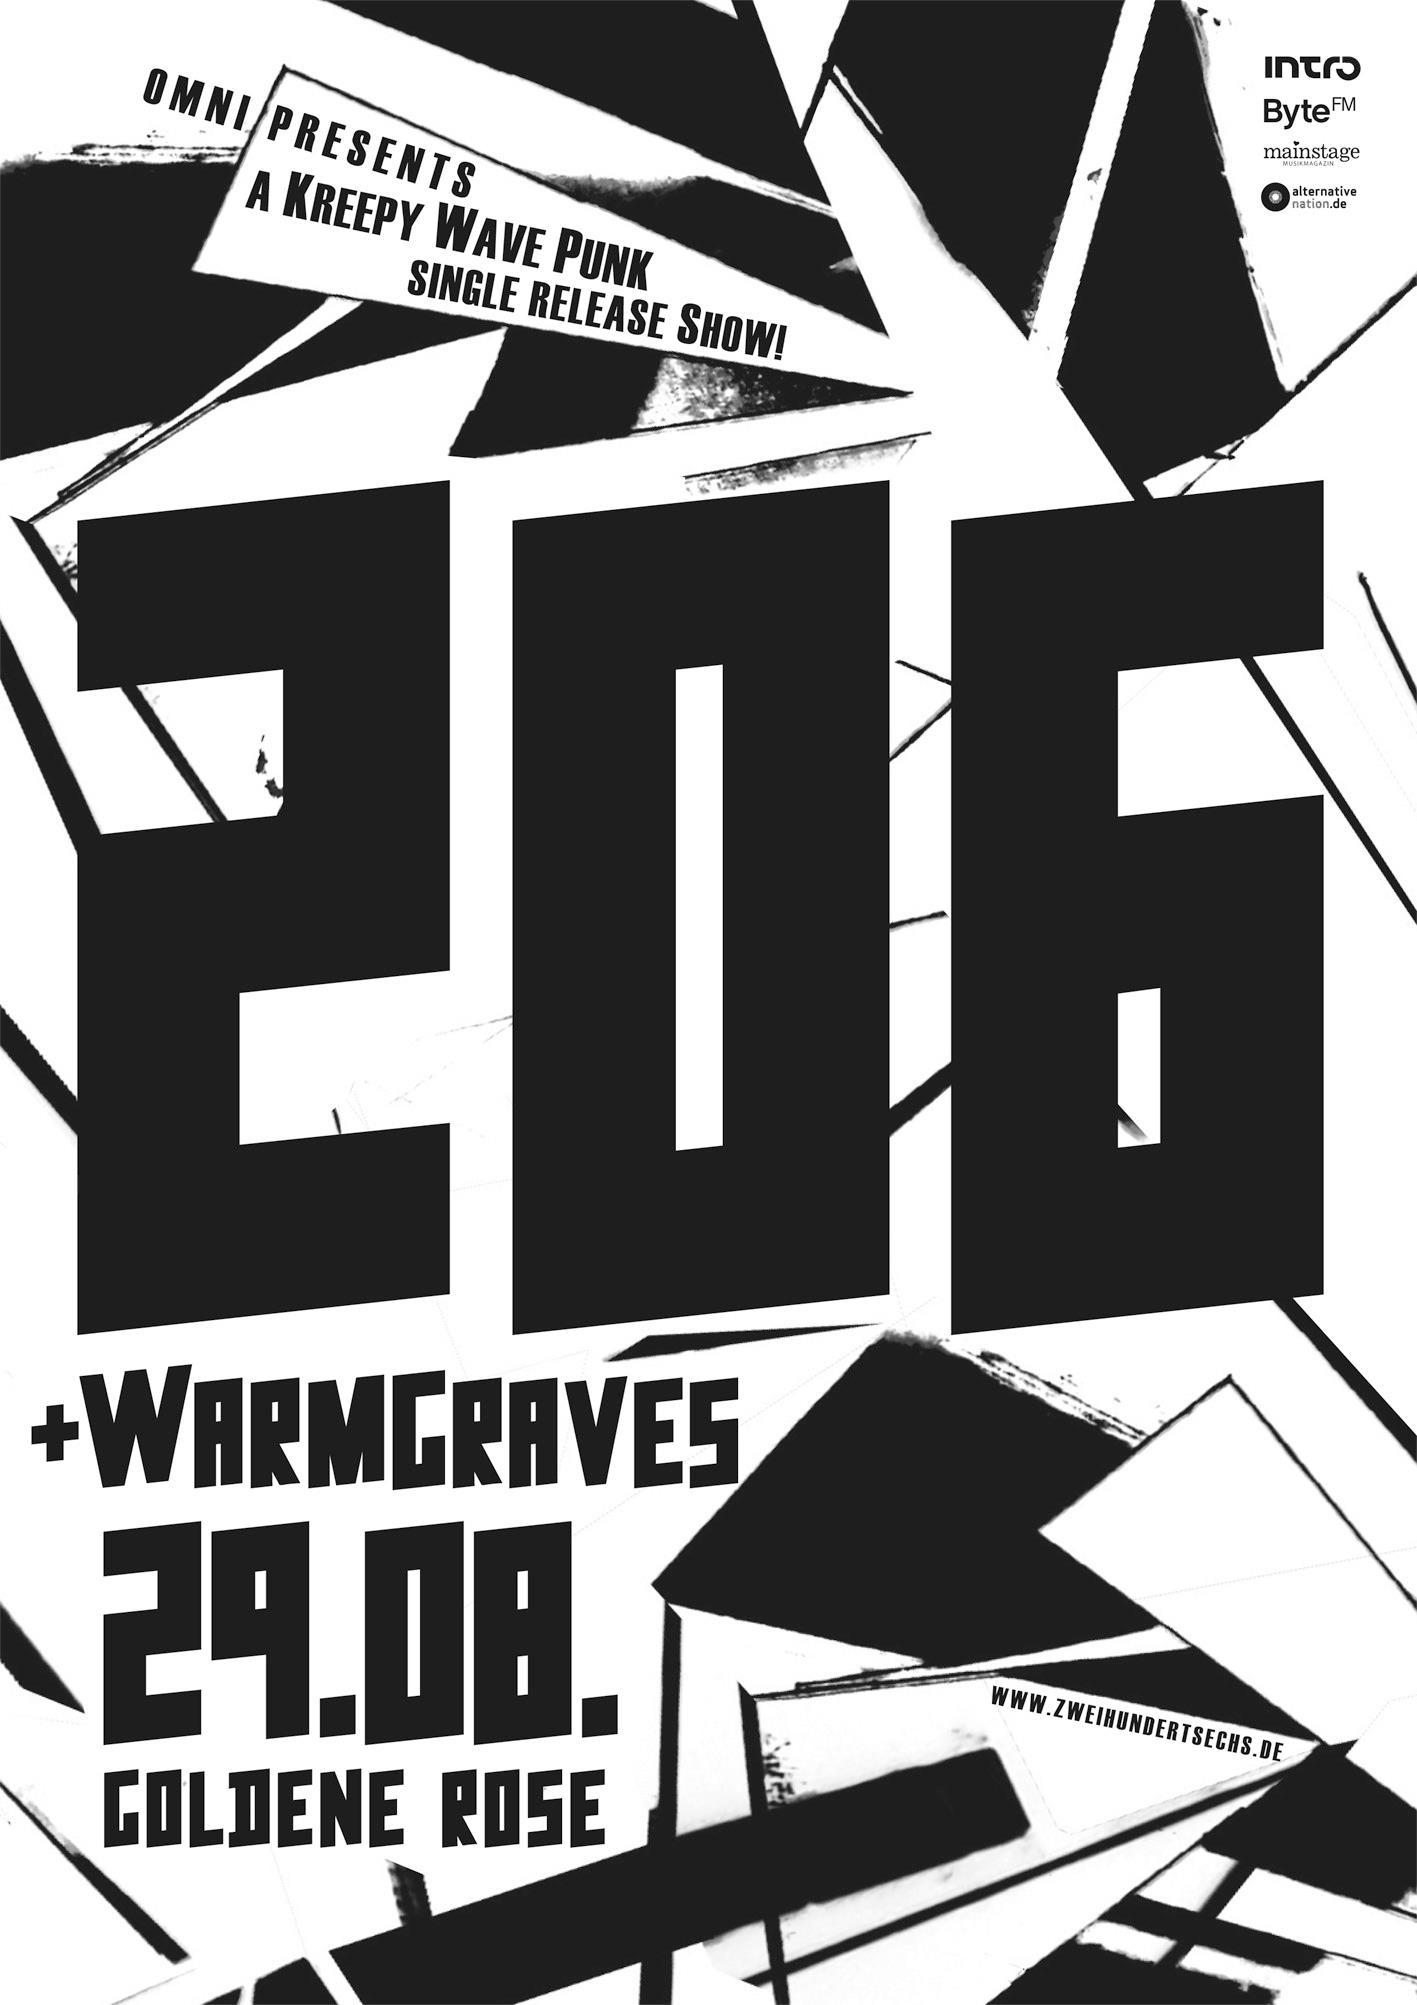 206 warm graves